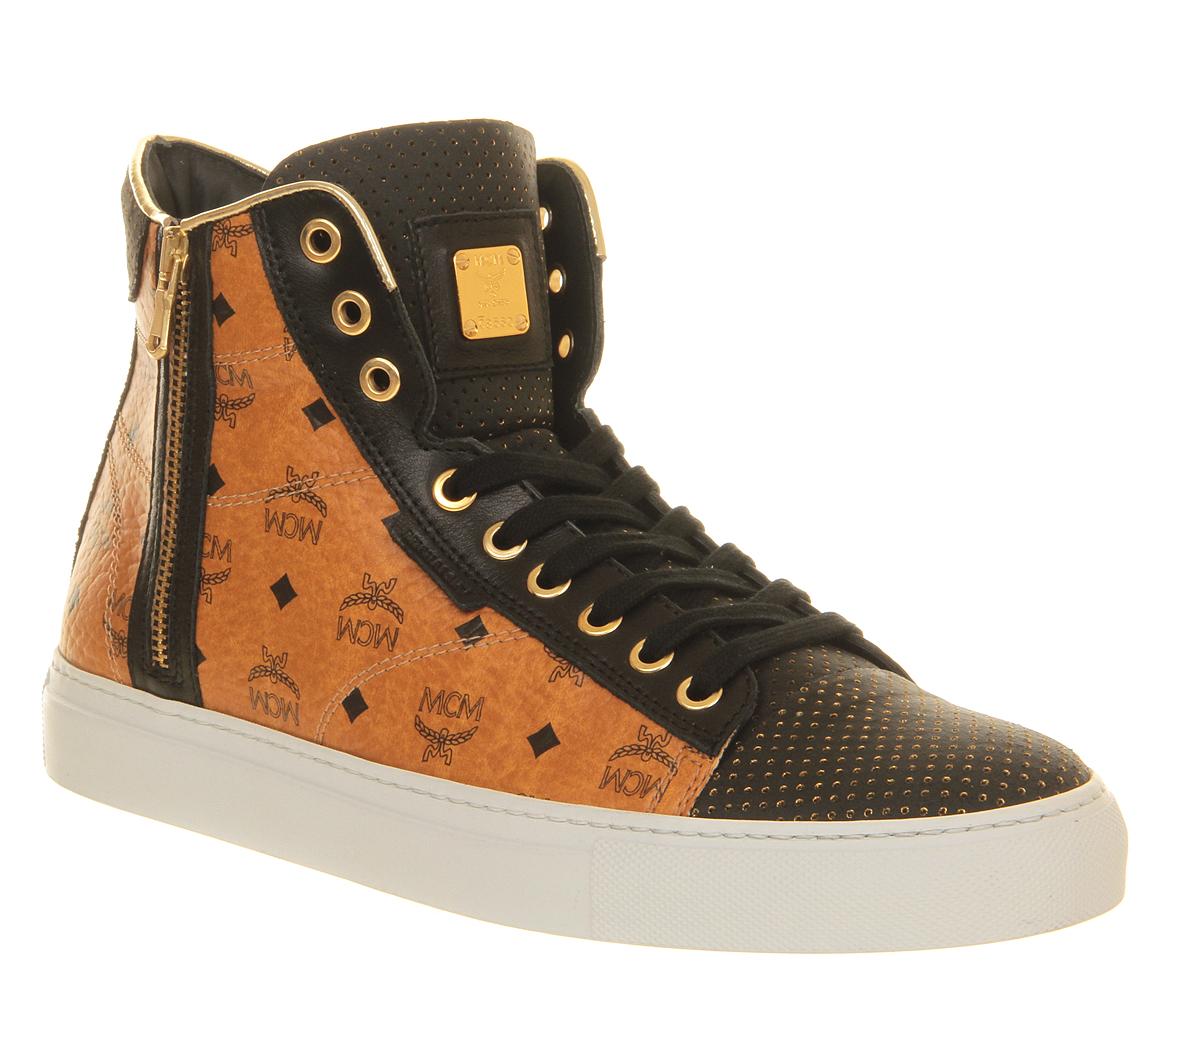 mcm michalsky urban nomad iii high cognac schuhe sneakers. Black Bedroom Furniture Sets. Home Design Ideas